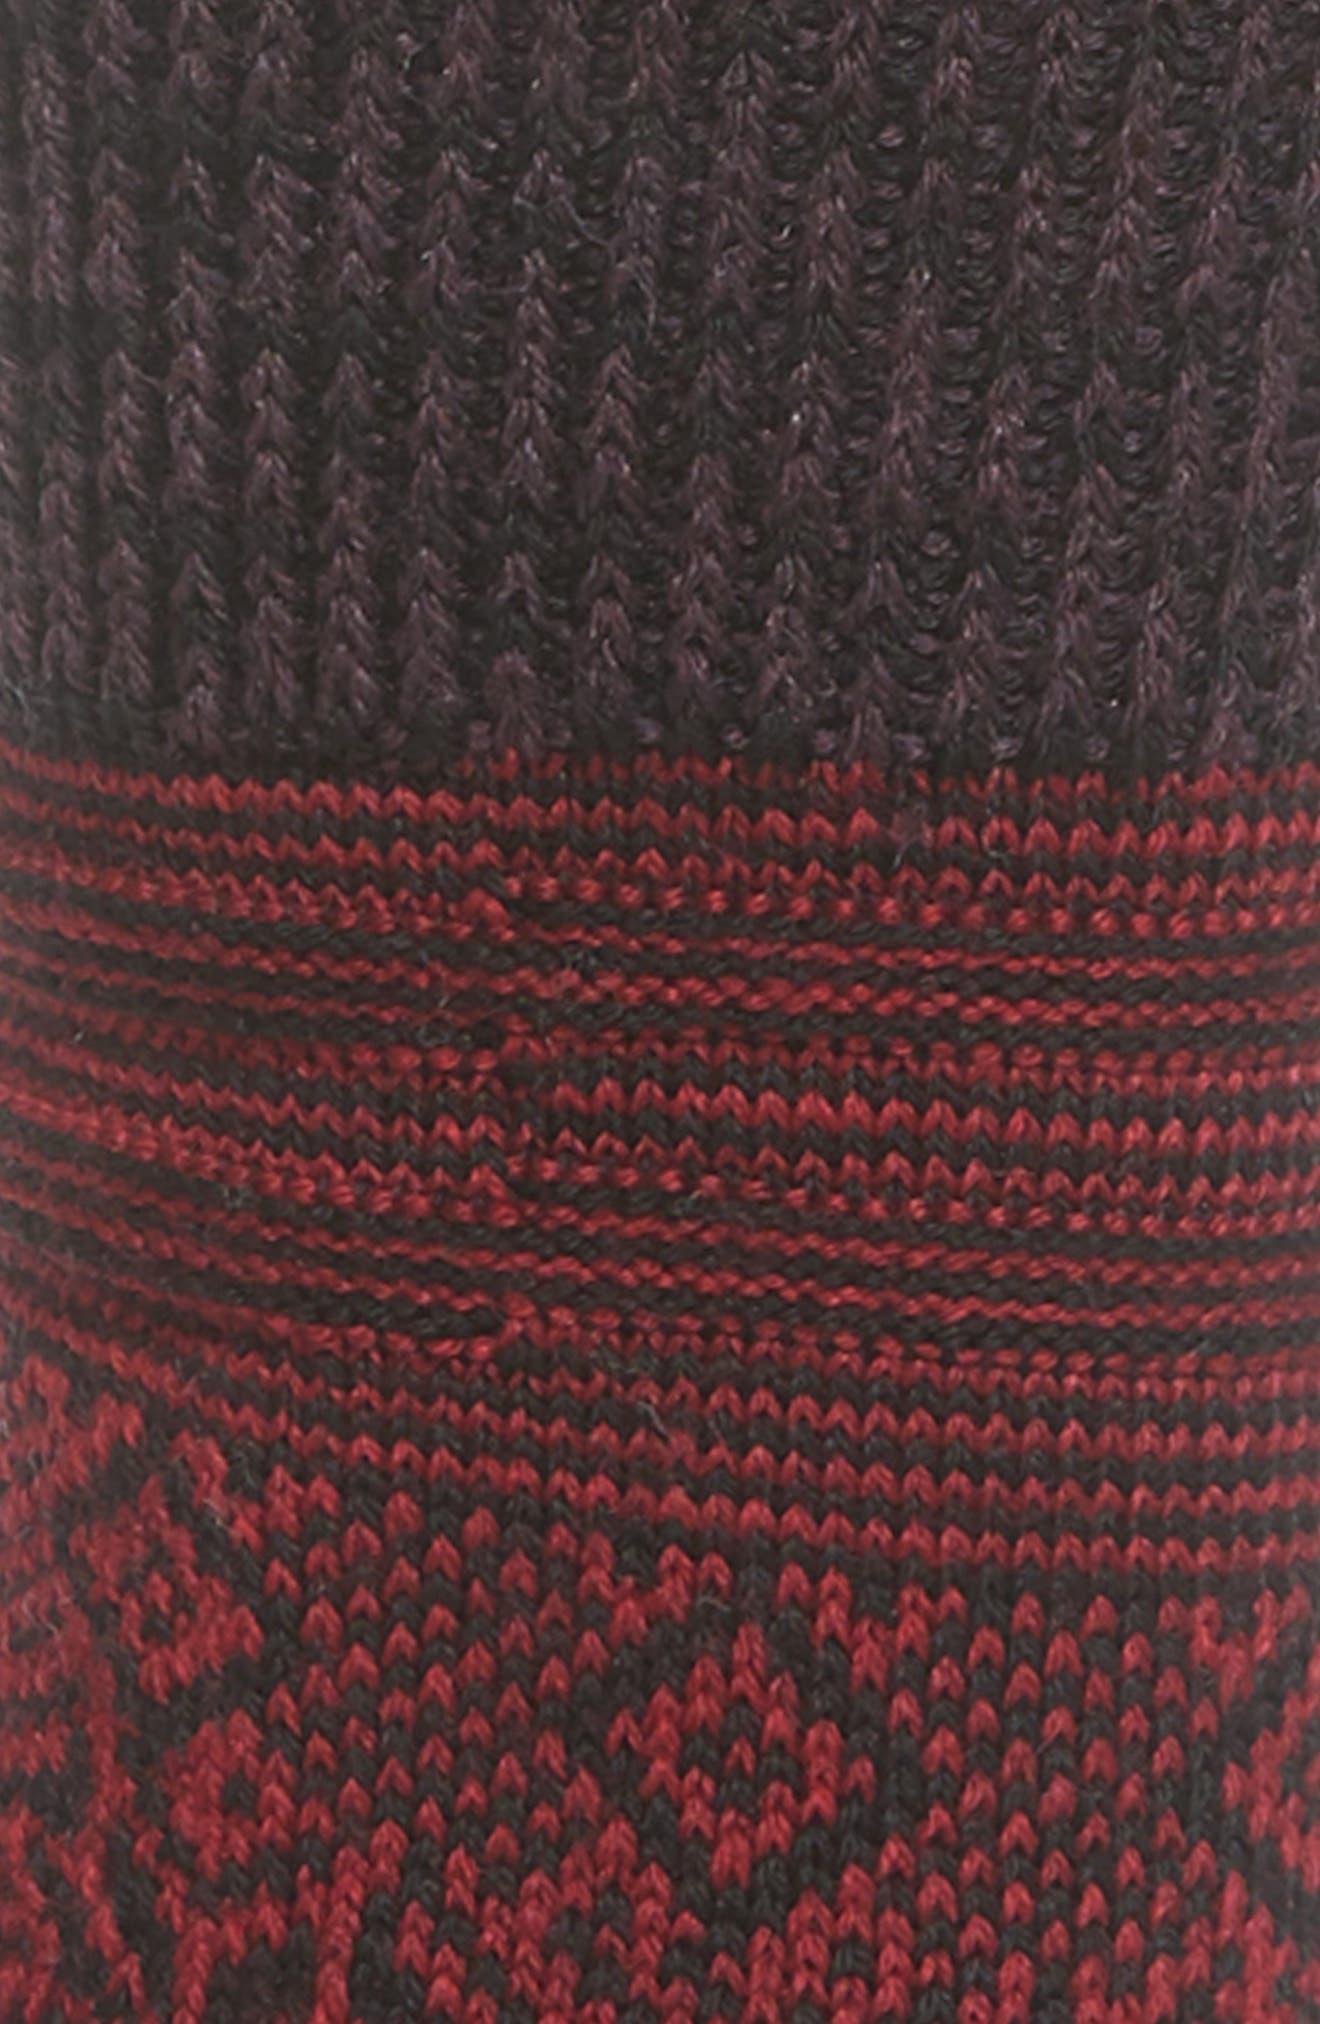 Snowflake Flurry Merino Wool Blend Socks,                             Alternate thumbnail 2, color,                             TIBETAN RED HEATHER